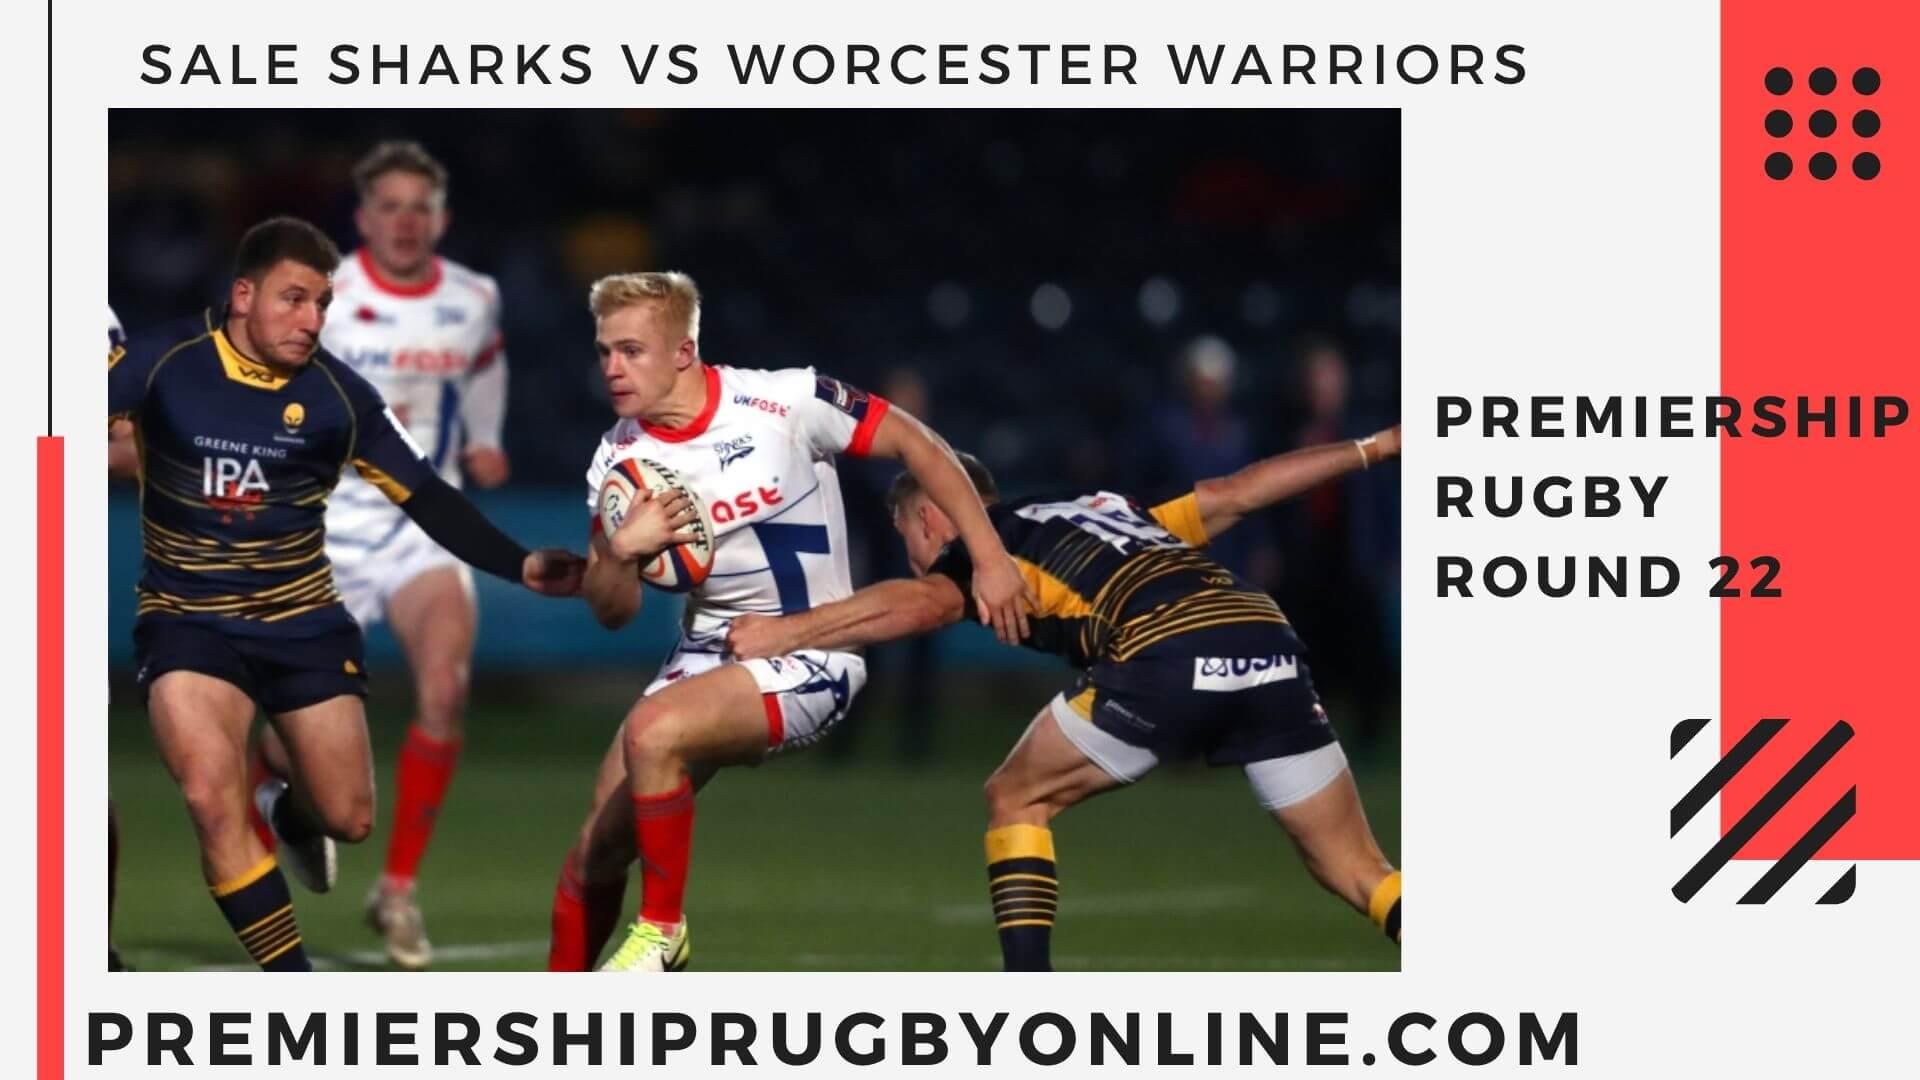 Sale Sharks vs Worcester Warriors  Live stream   Round 22